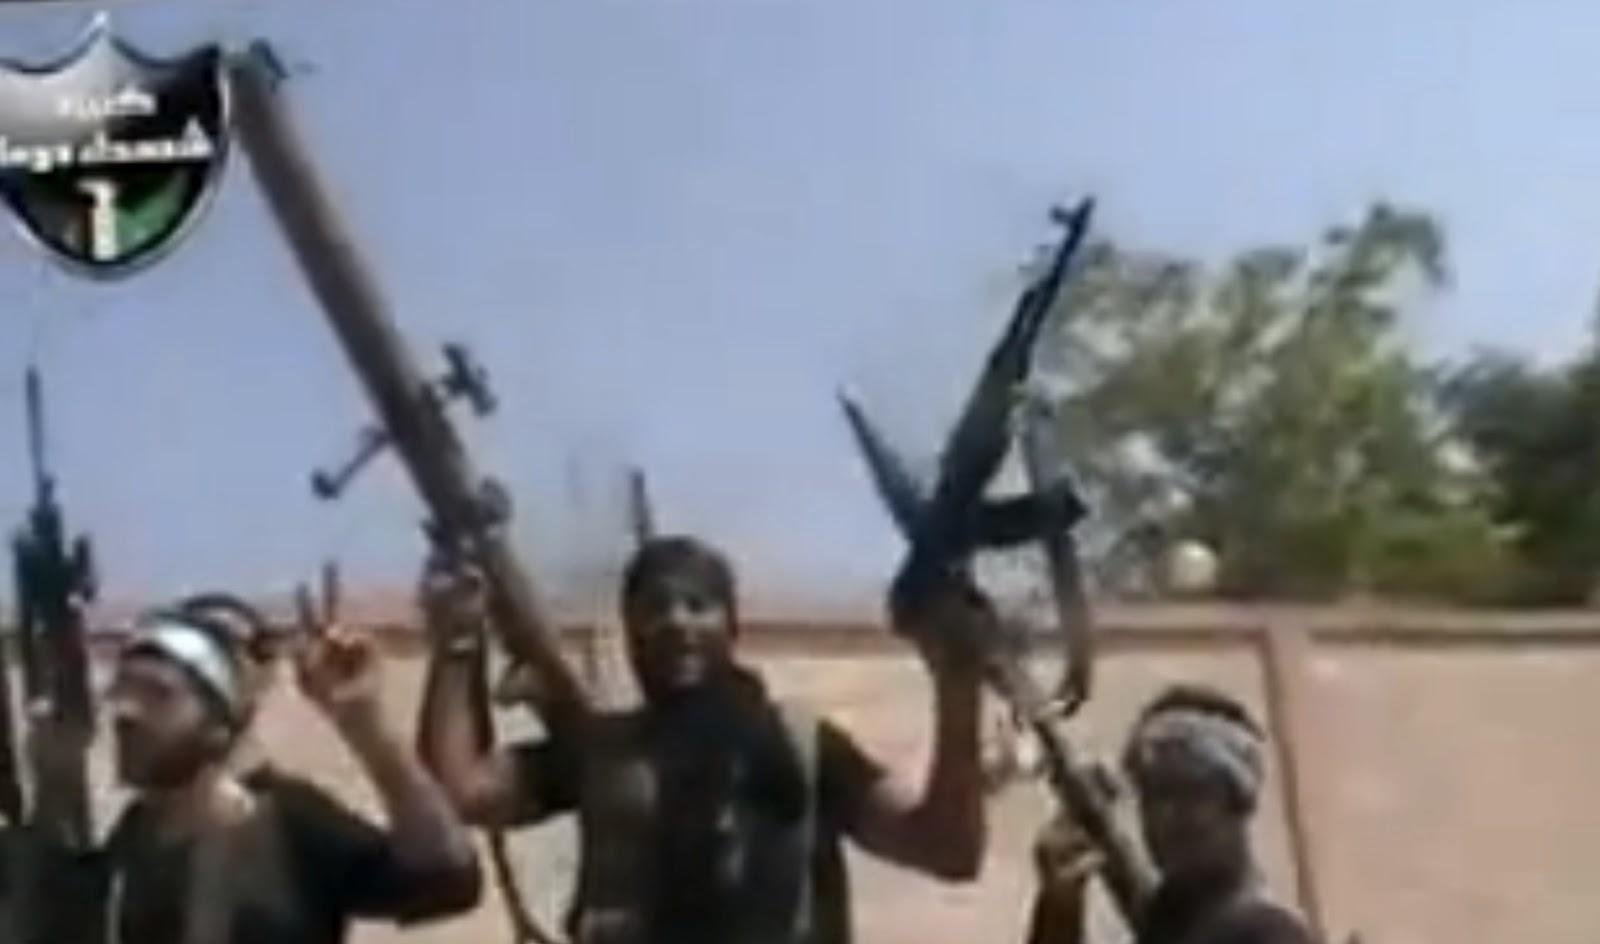 http://3.bp.blogspot.com/-be73dyR44Tw/T-8QDv-GTNI/AAAAAAAAB00/fjecM1RB_Bk/s1600/Douma-tank-killer-Maybe-RL-83-Blindicide-01.jpg